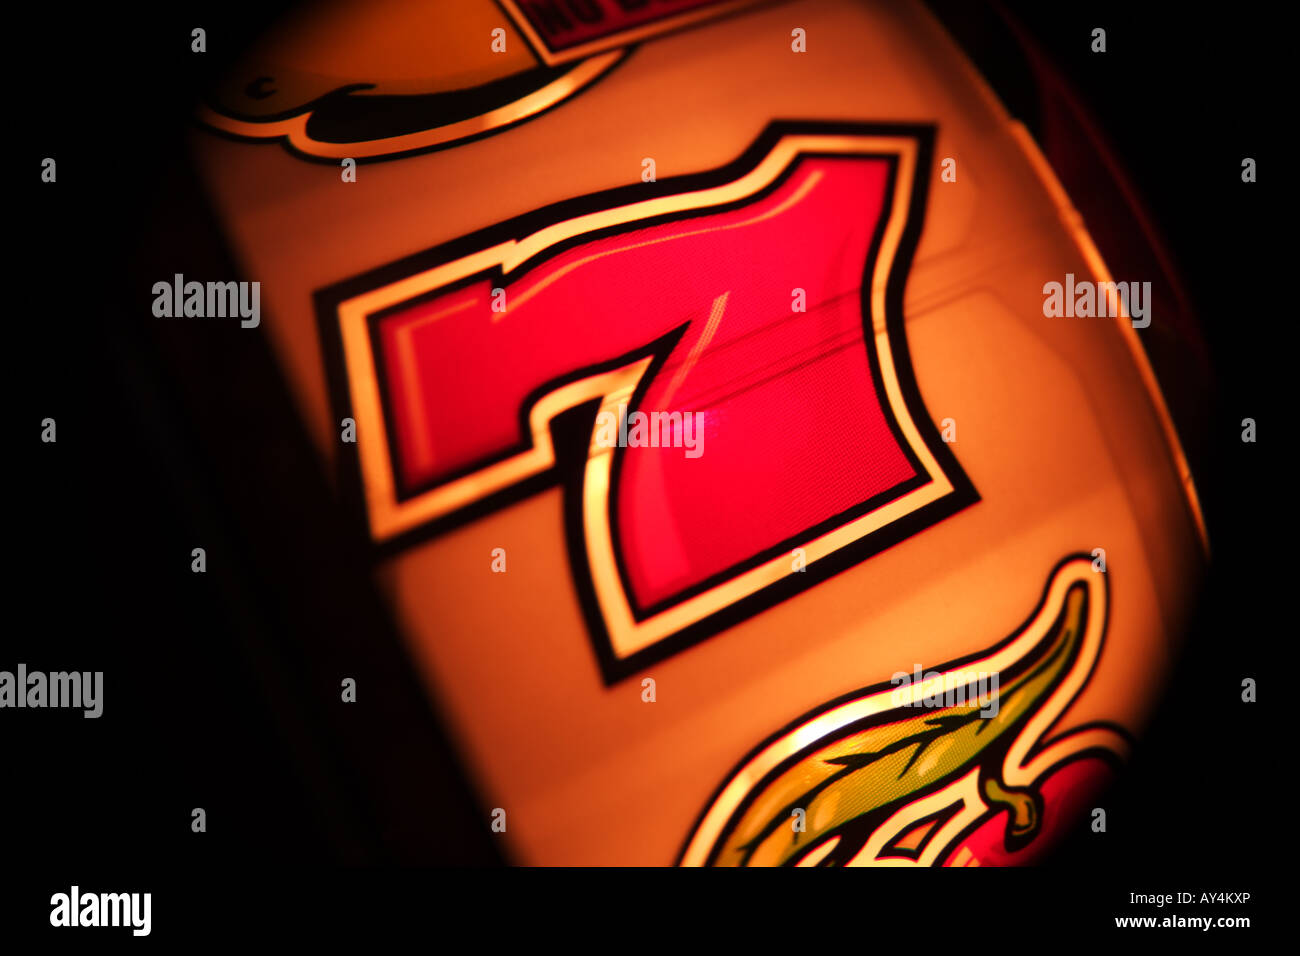 number 7 seven on slot machine fruit machine in amusement arcade